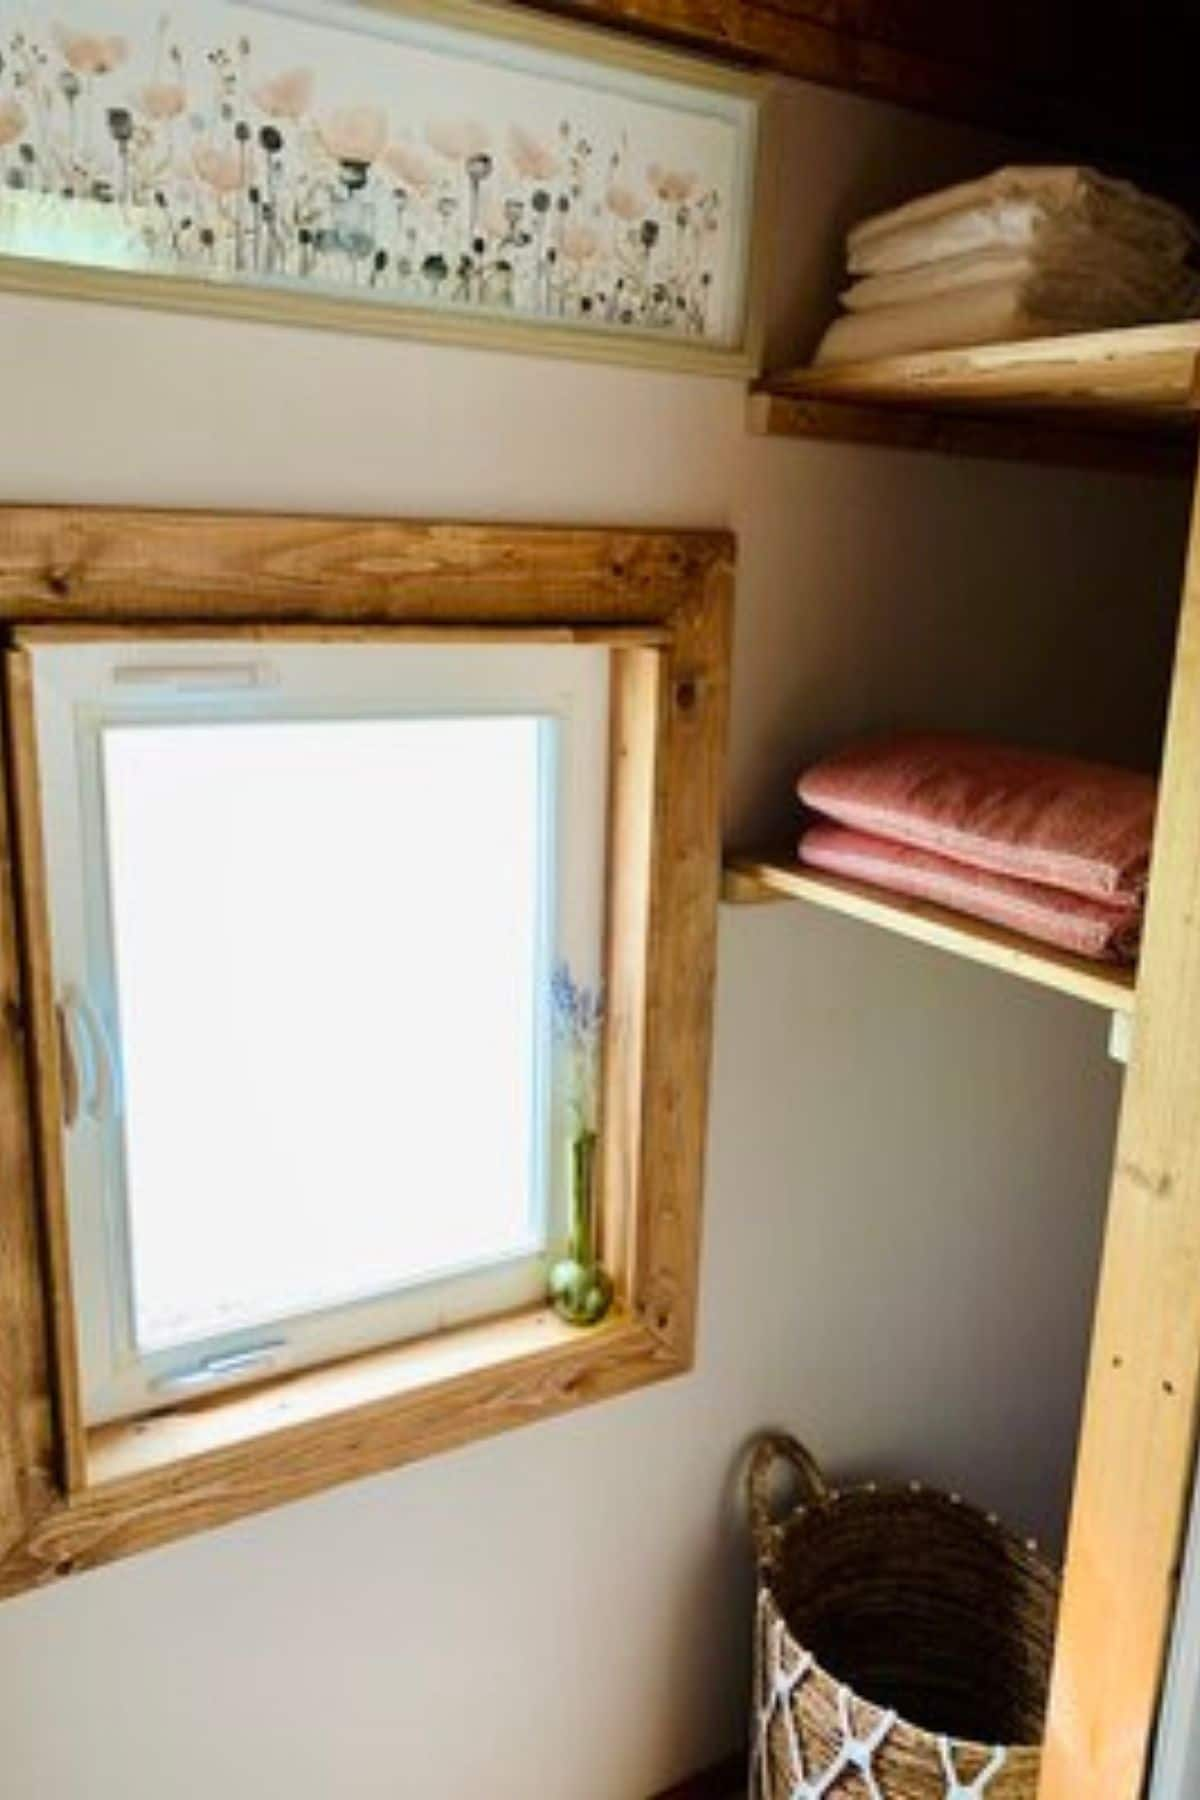 toiletry storage shelves by window in bathroom